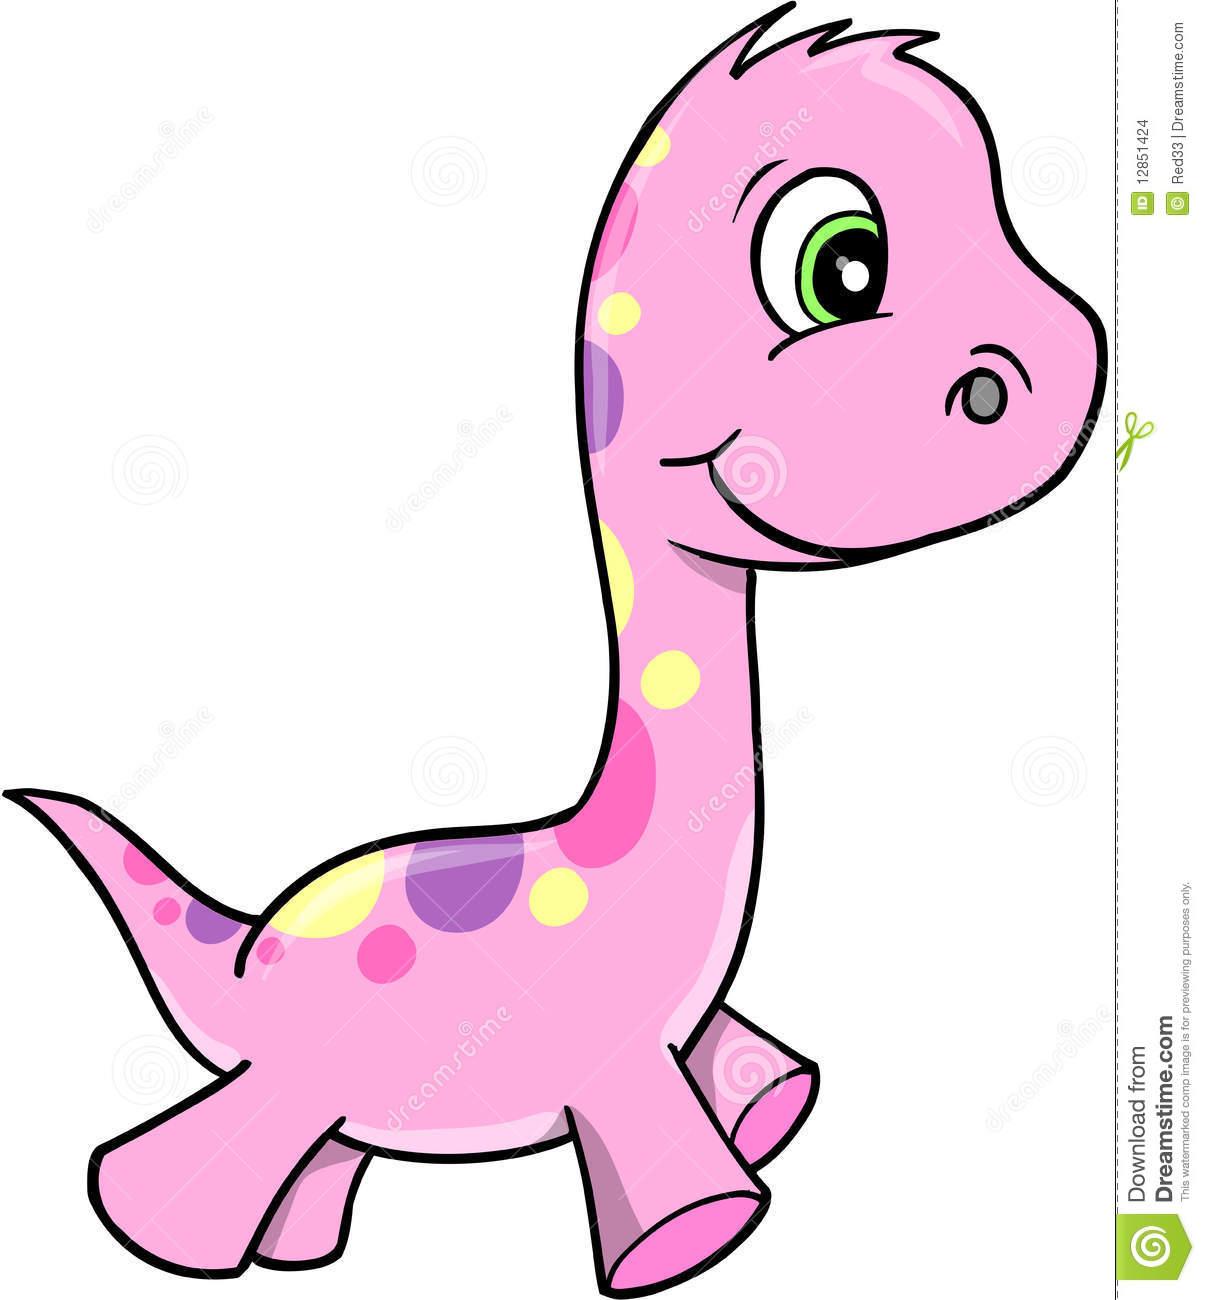 Cute Dinosaur | Clipart Panda - Free Clipart Images